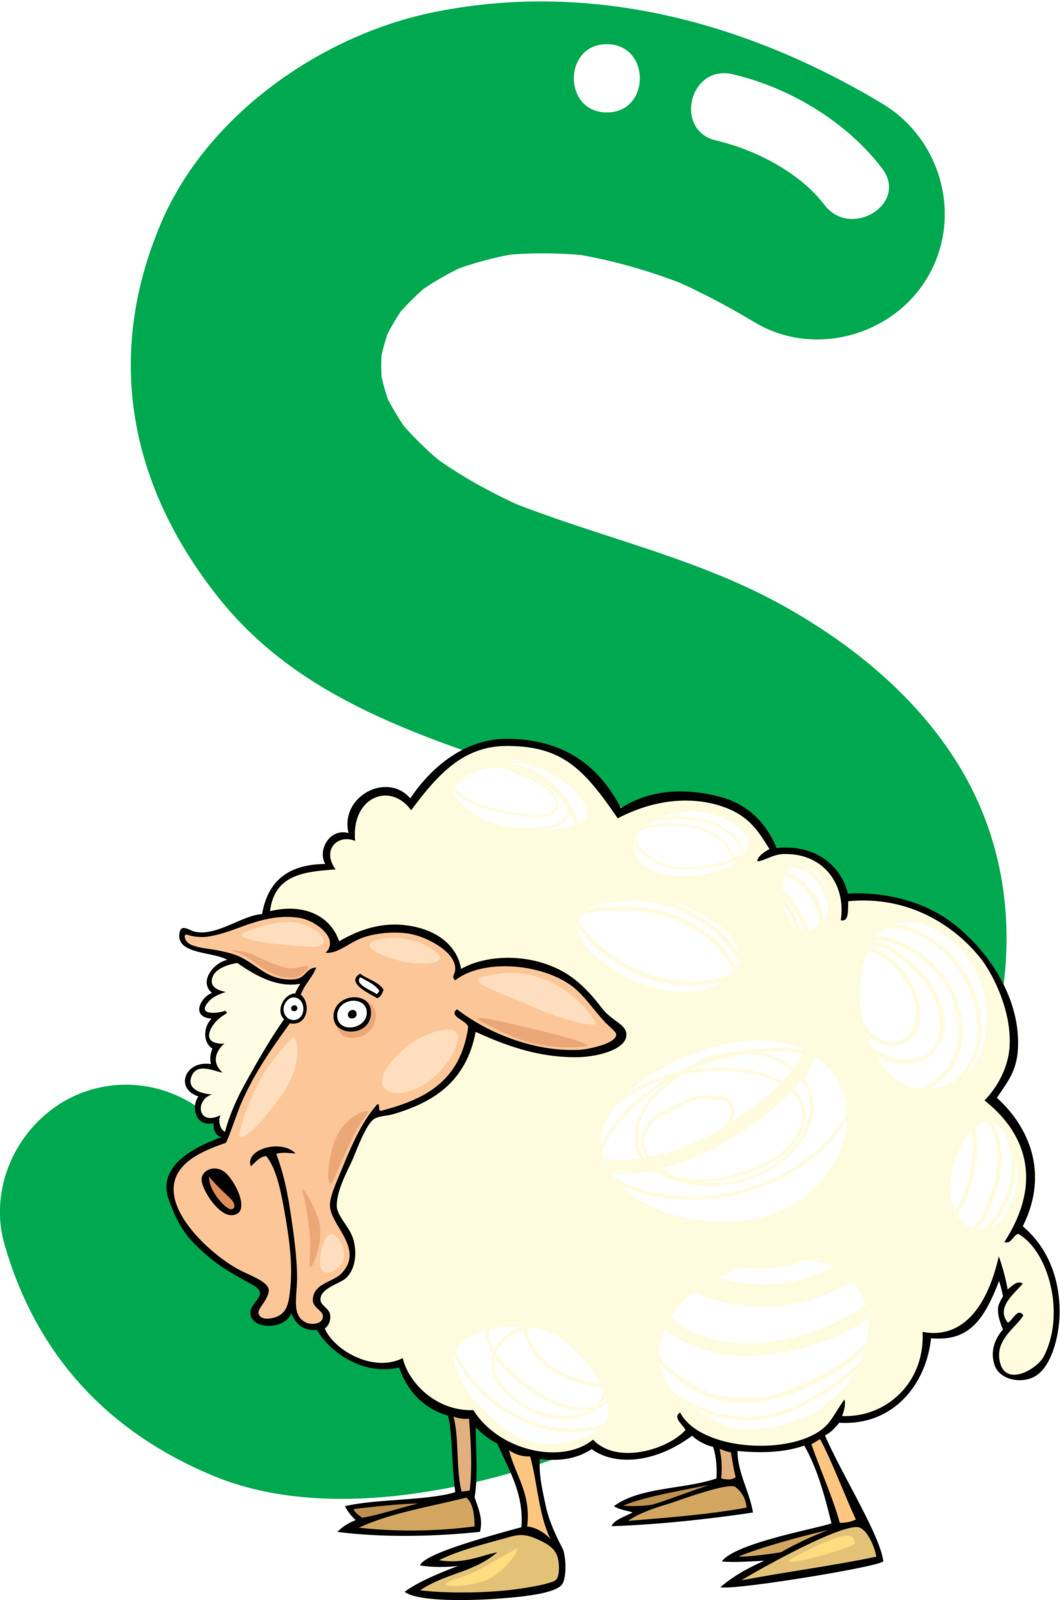 cartoon illustration of S letter for sheep